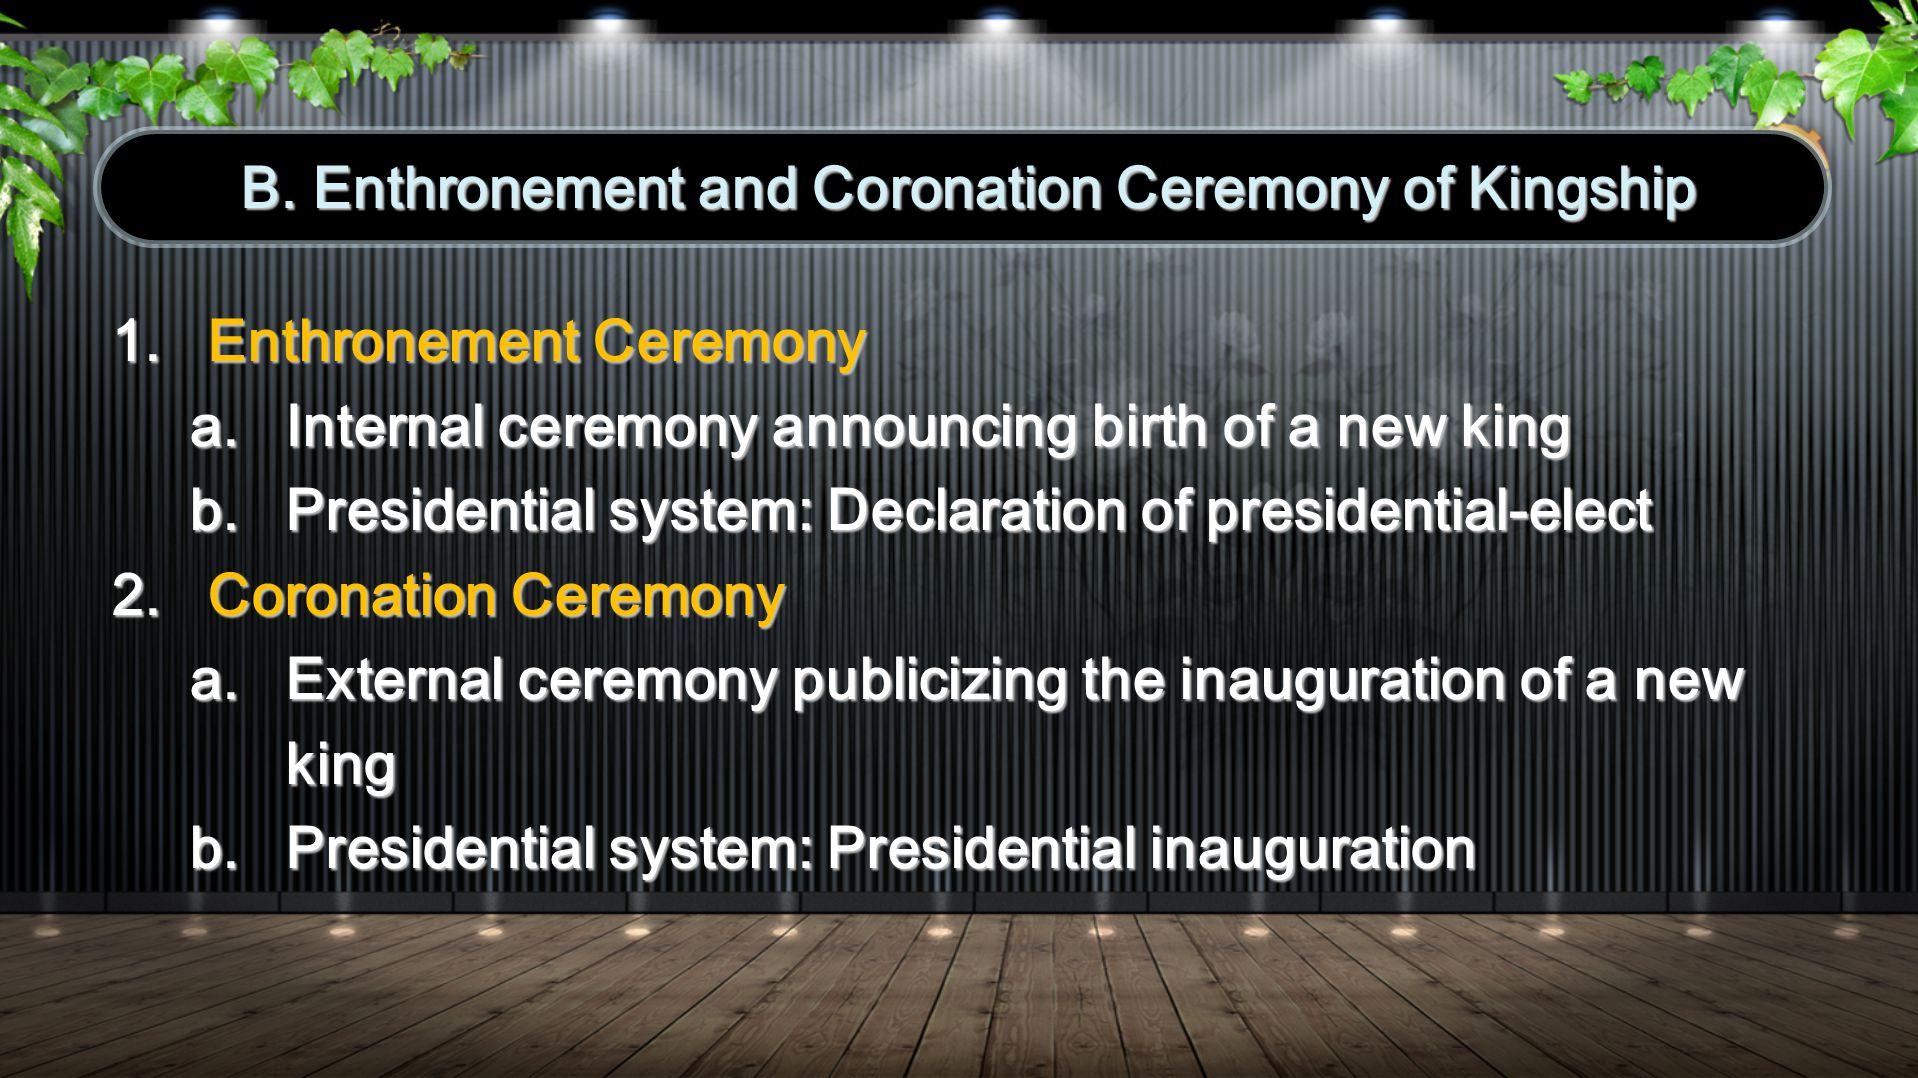 1.Enthronement Ceremony of Gods Kingship (1/13/01) 2.